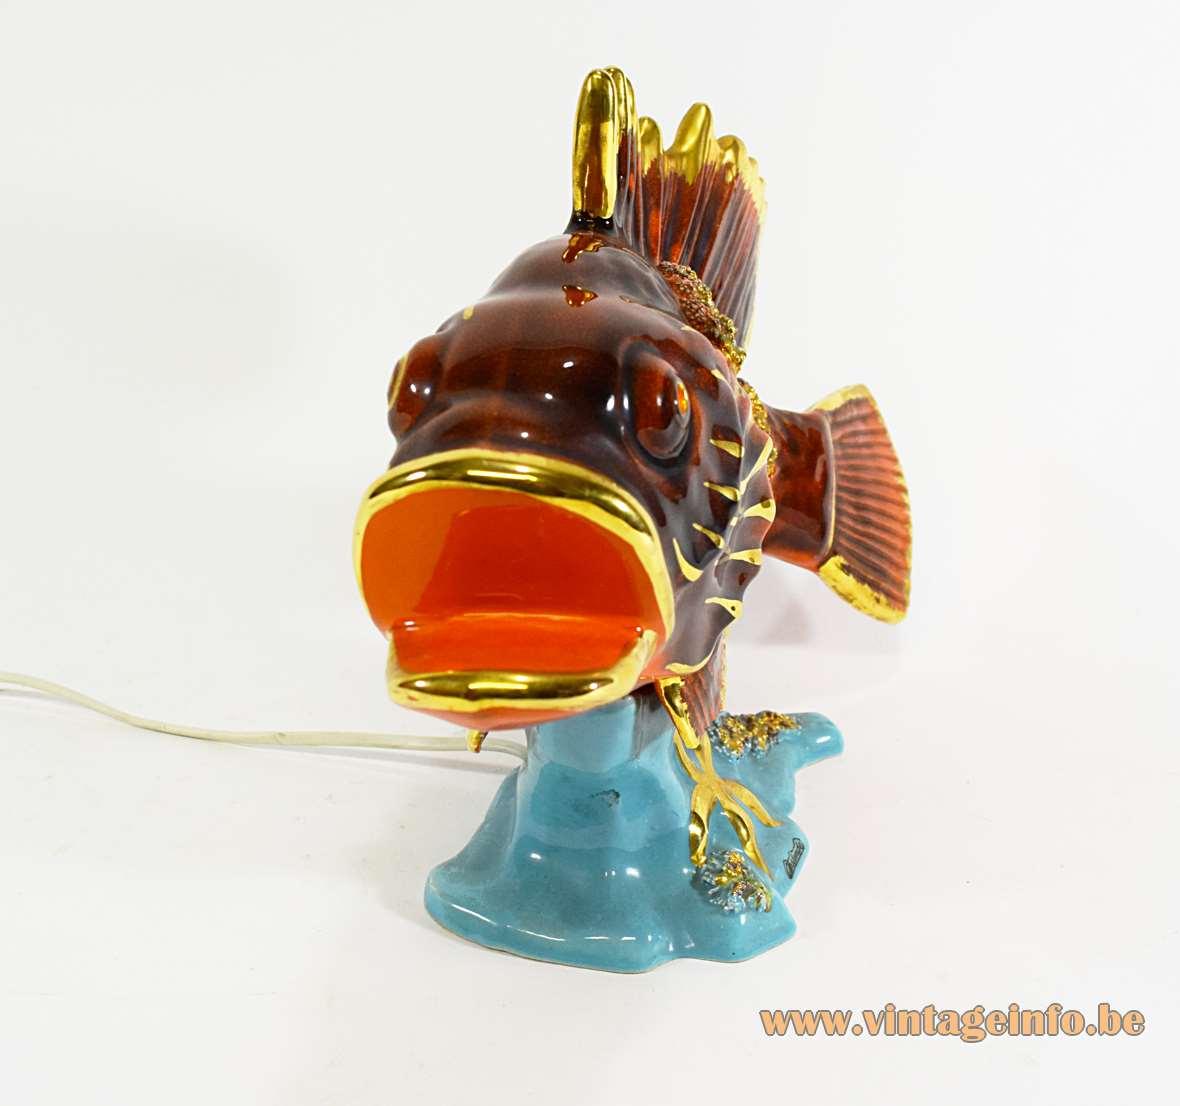 Vallauris Ceramic Fish Table Lamp tourist souvenir kitsch starfish shellfish 1950s 1960s France MCM